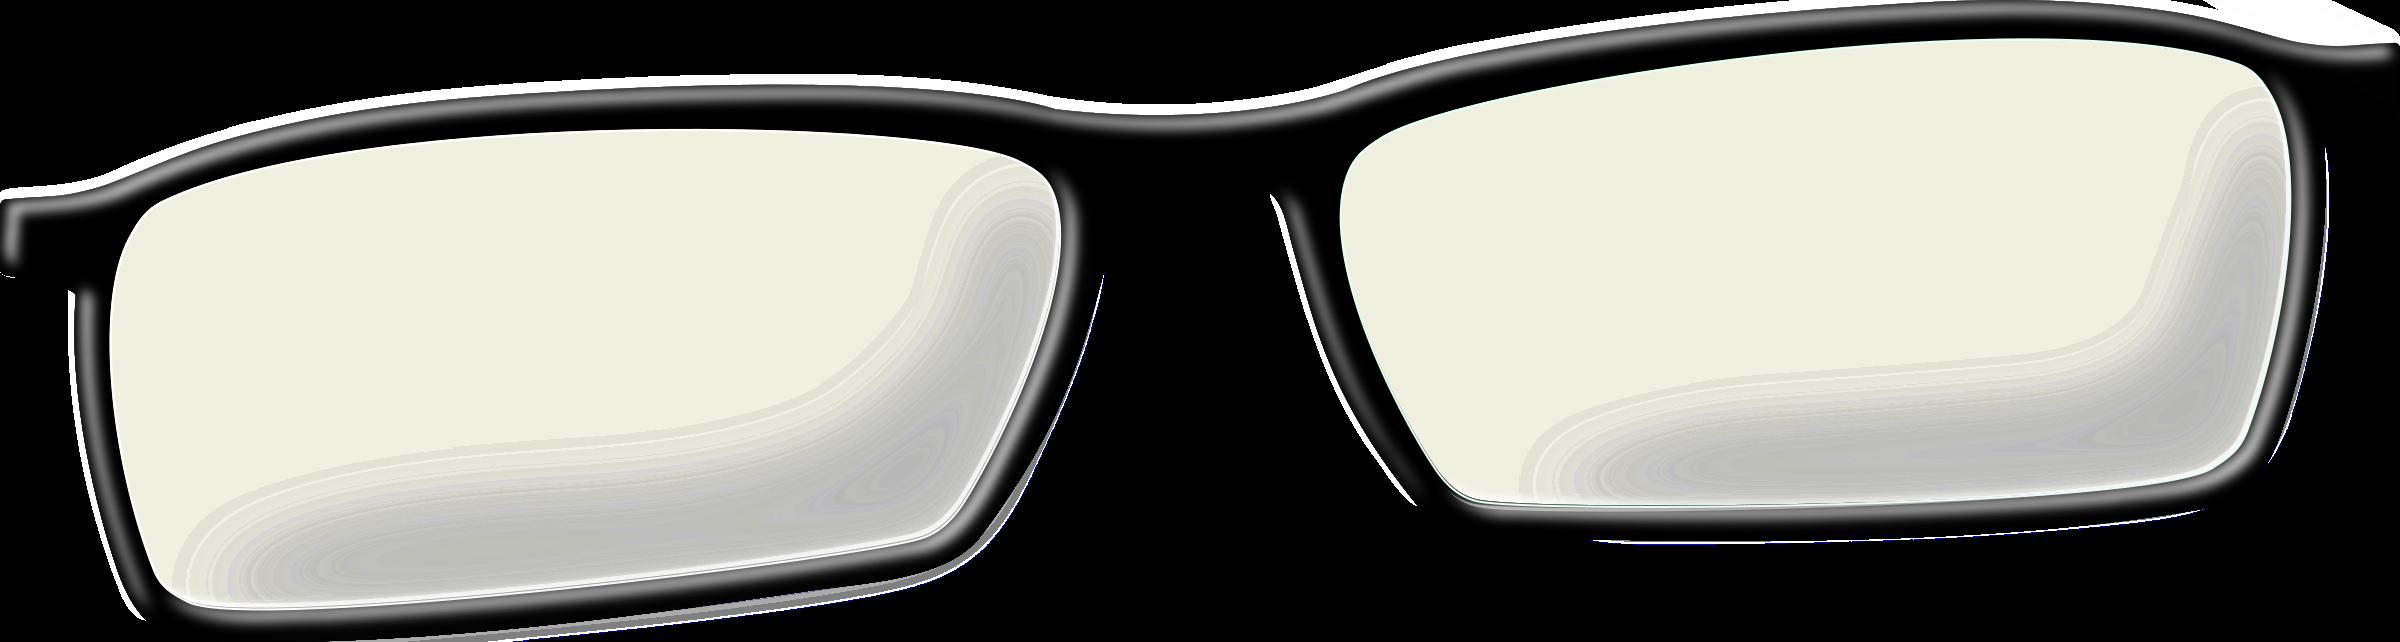 Sunglasses Eyewear Clip art.